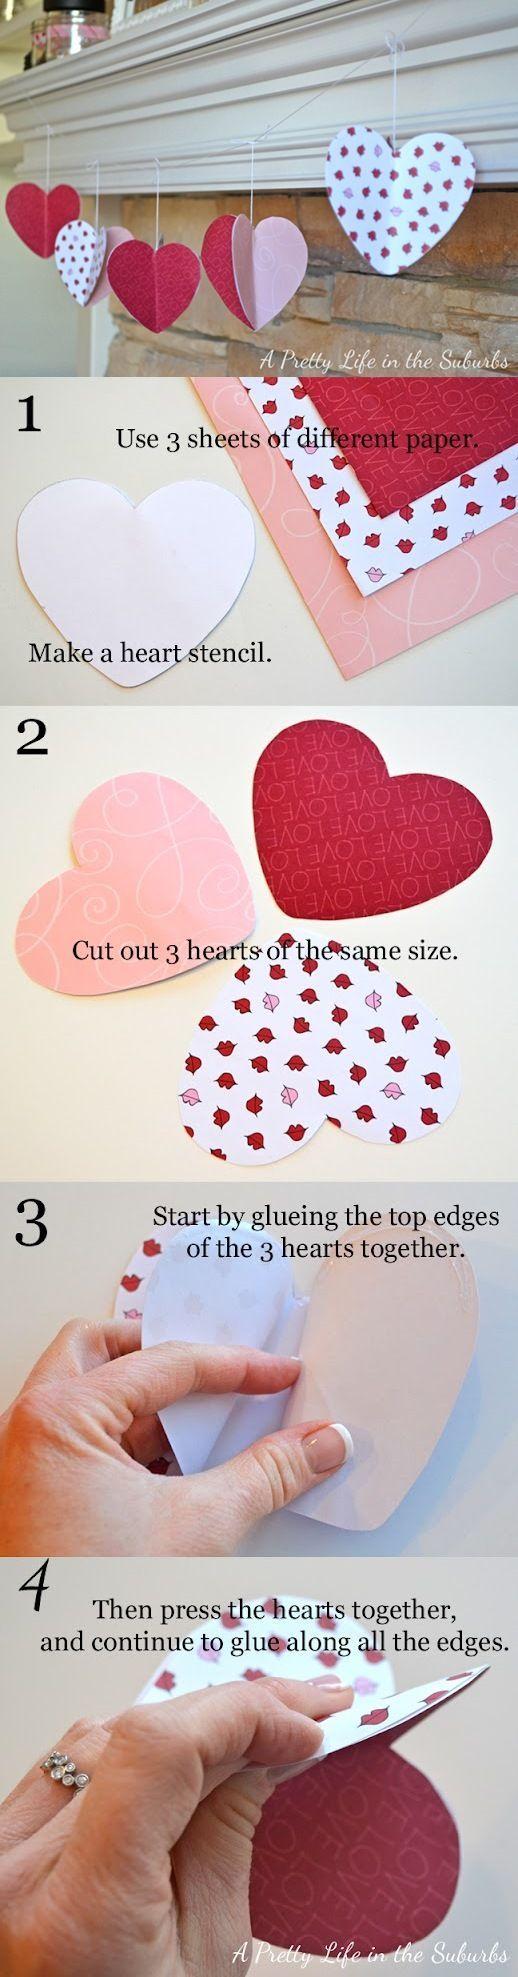 Papel de San Valentín 3D Corazón Garland: